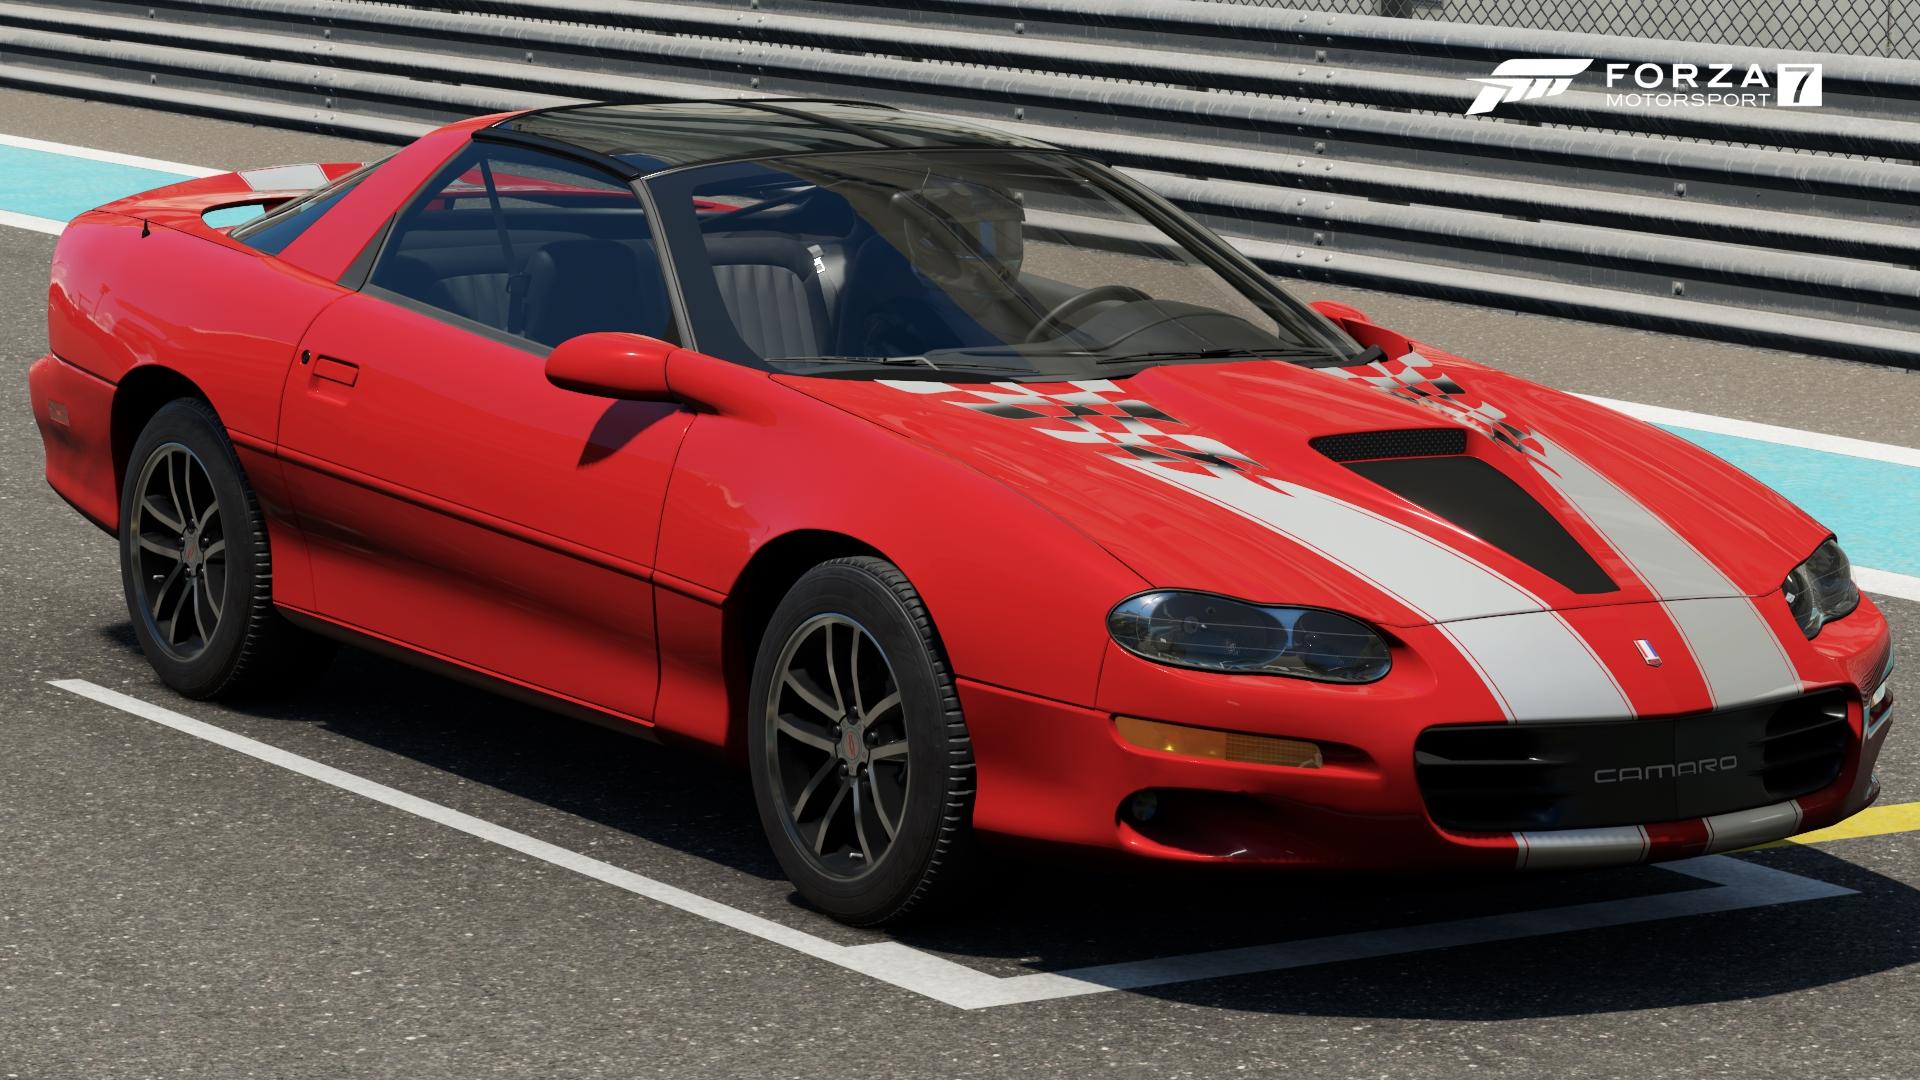 Chevrolet Camaro 35th Anniversary Super Sport In Forza Motorsport 7